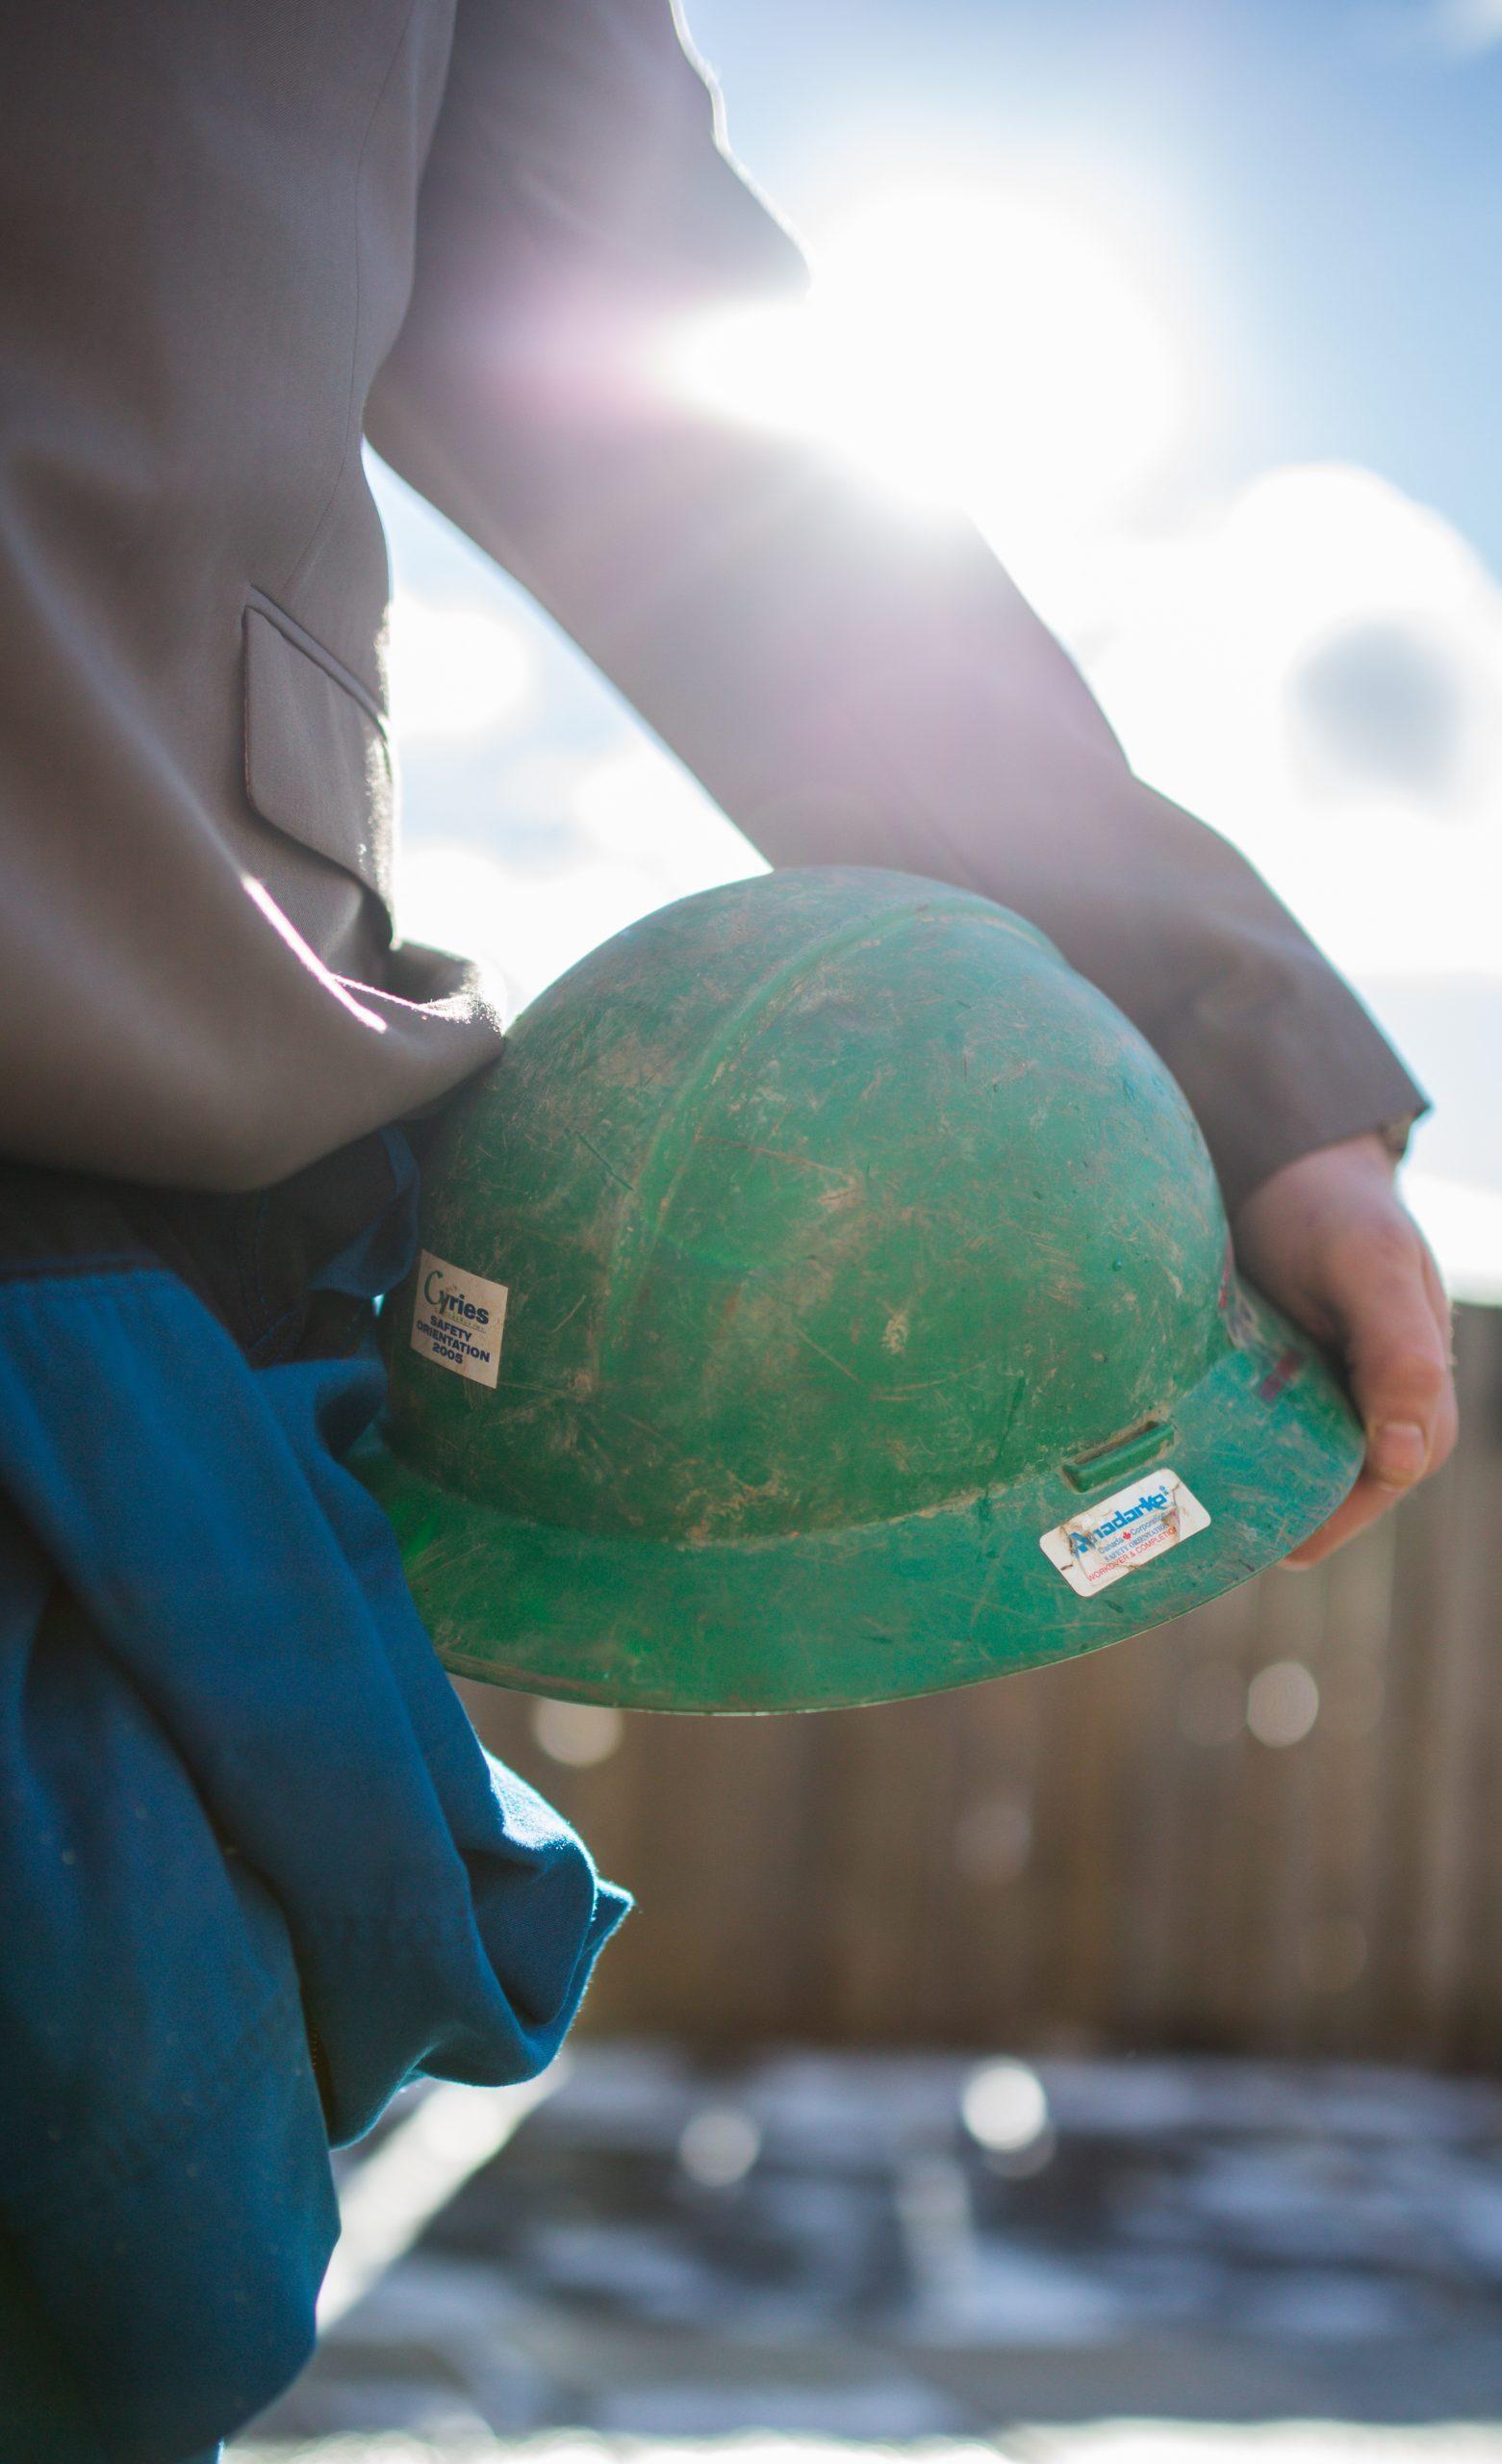 Matt Scott wearing blue coveralls holding green construction hard hat on his hip